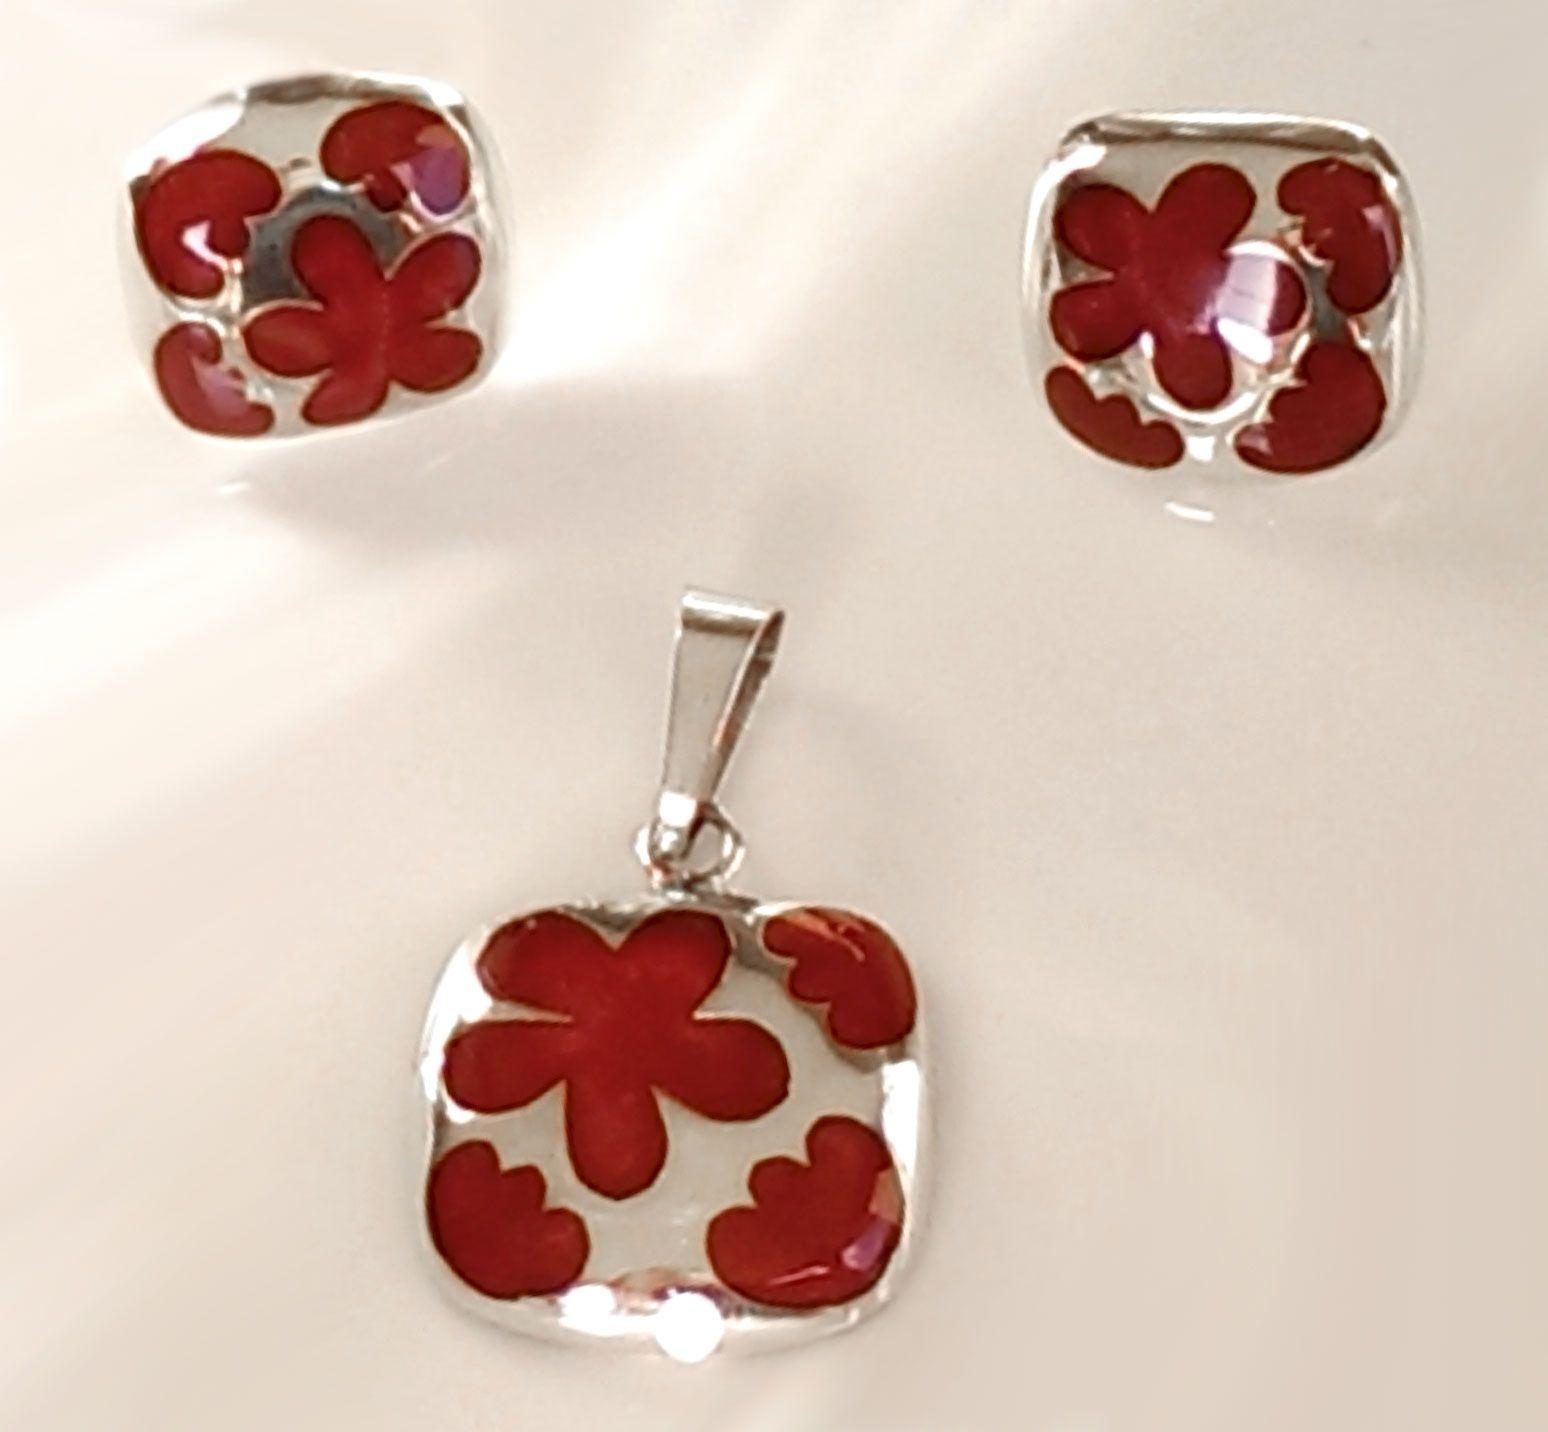 9b0ff8a0592a Set de Aretes y Dije de Plata .925 Diseño  Cuadrados con Flores caladas  rellenas de resina roja